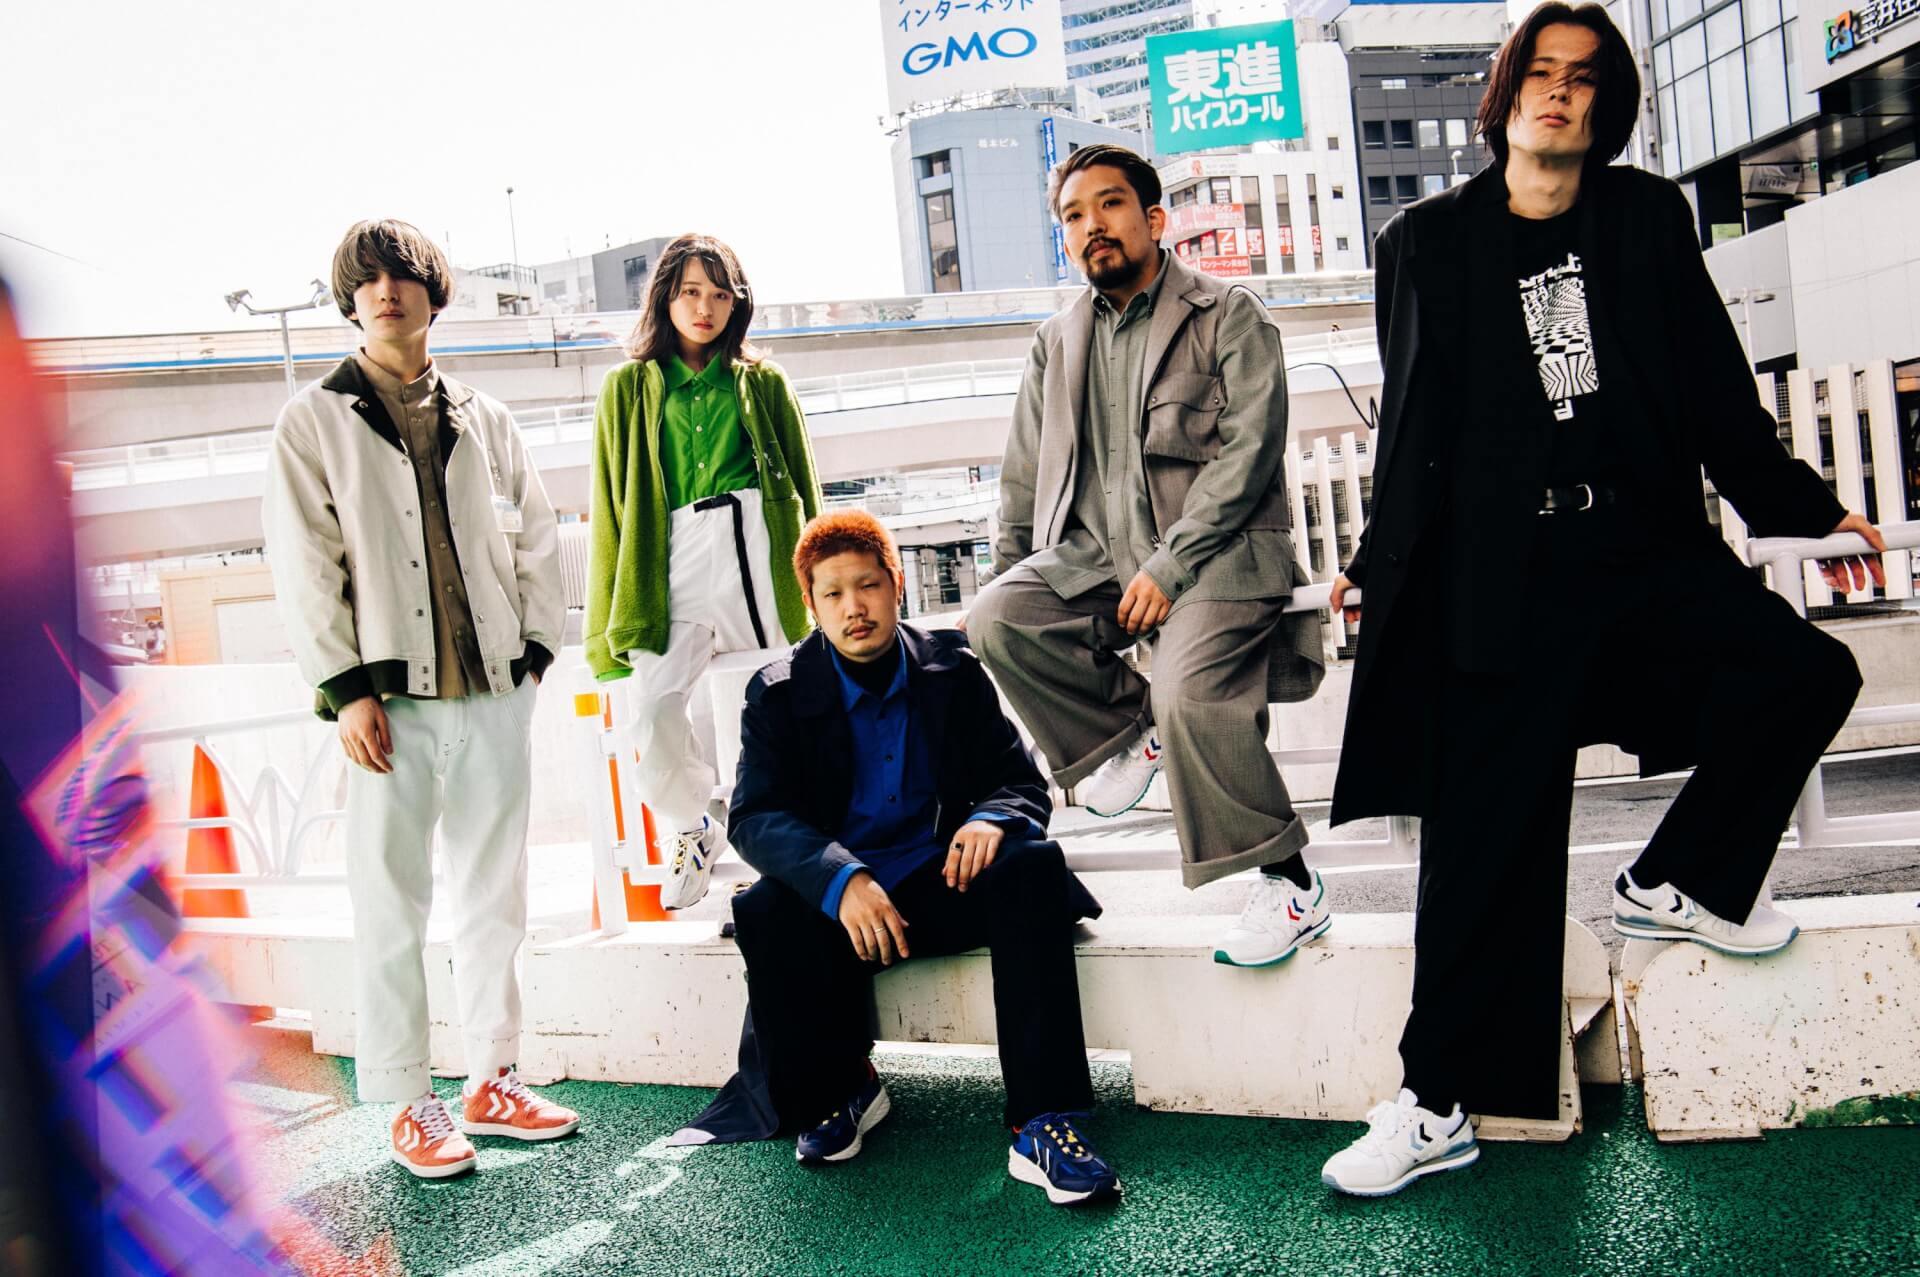 Photo Session|gato × HUMMEL HIVE at Shibuya lf201022_hummel_gato_3046